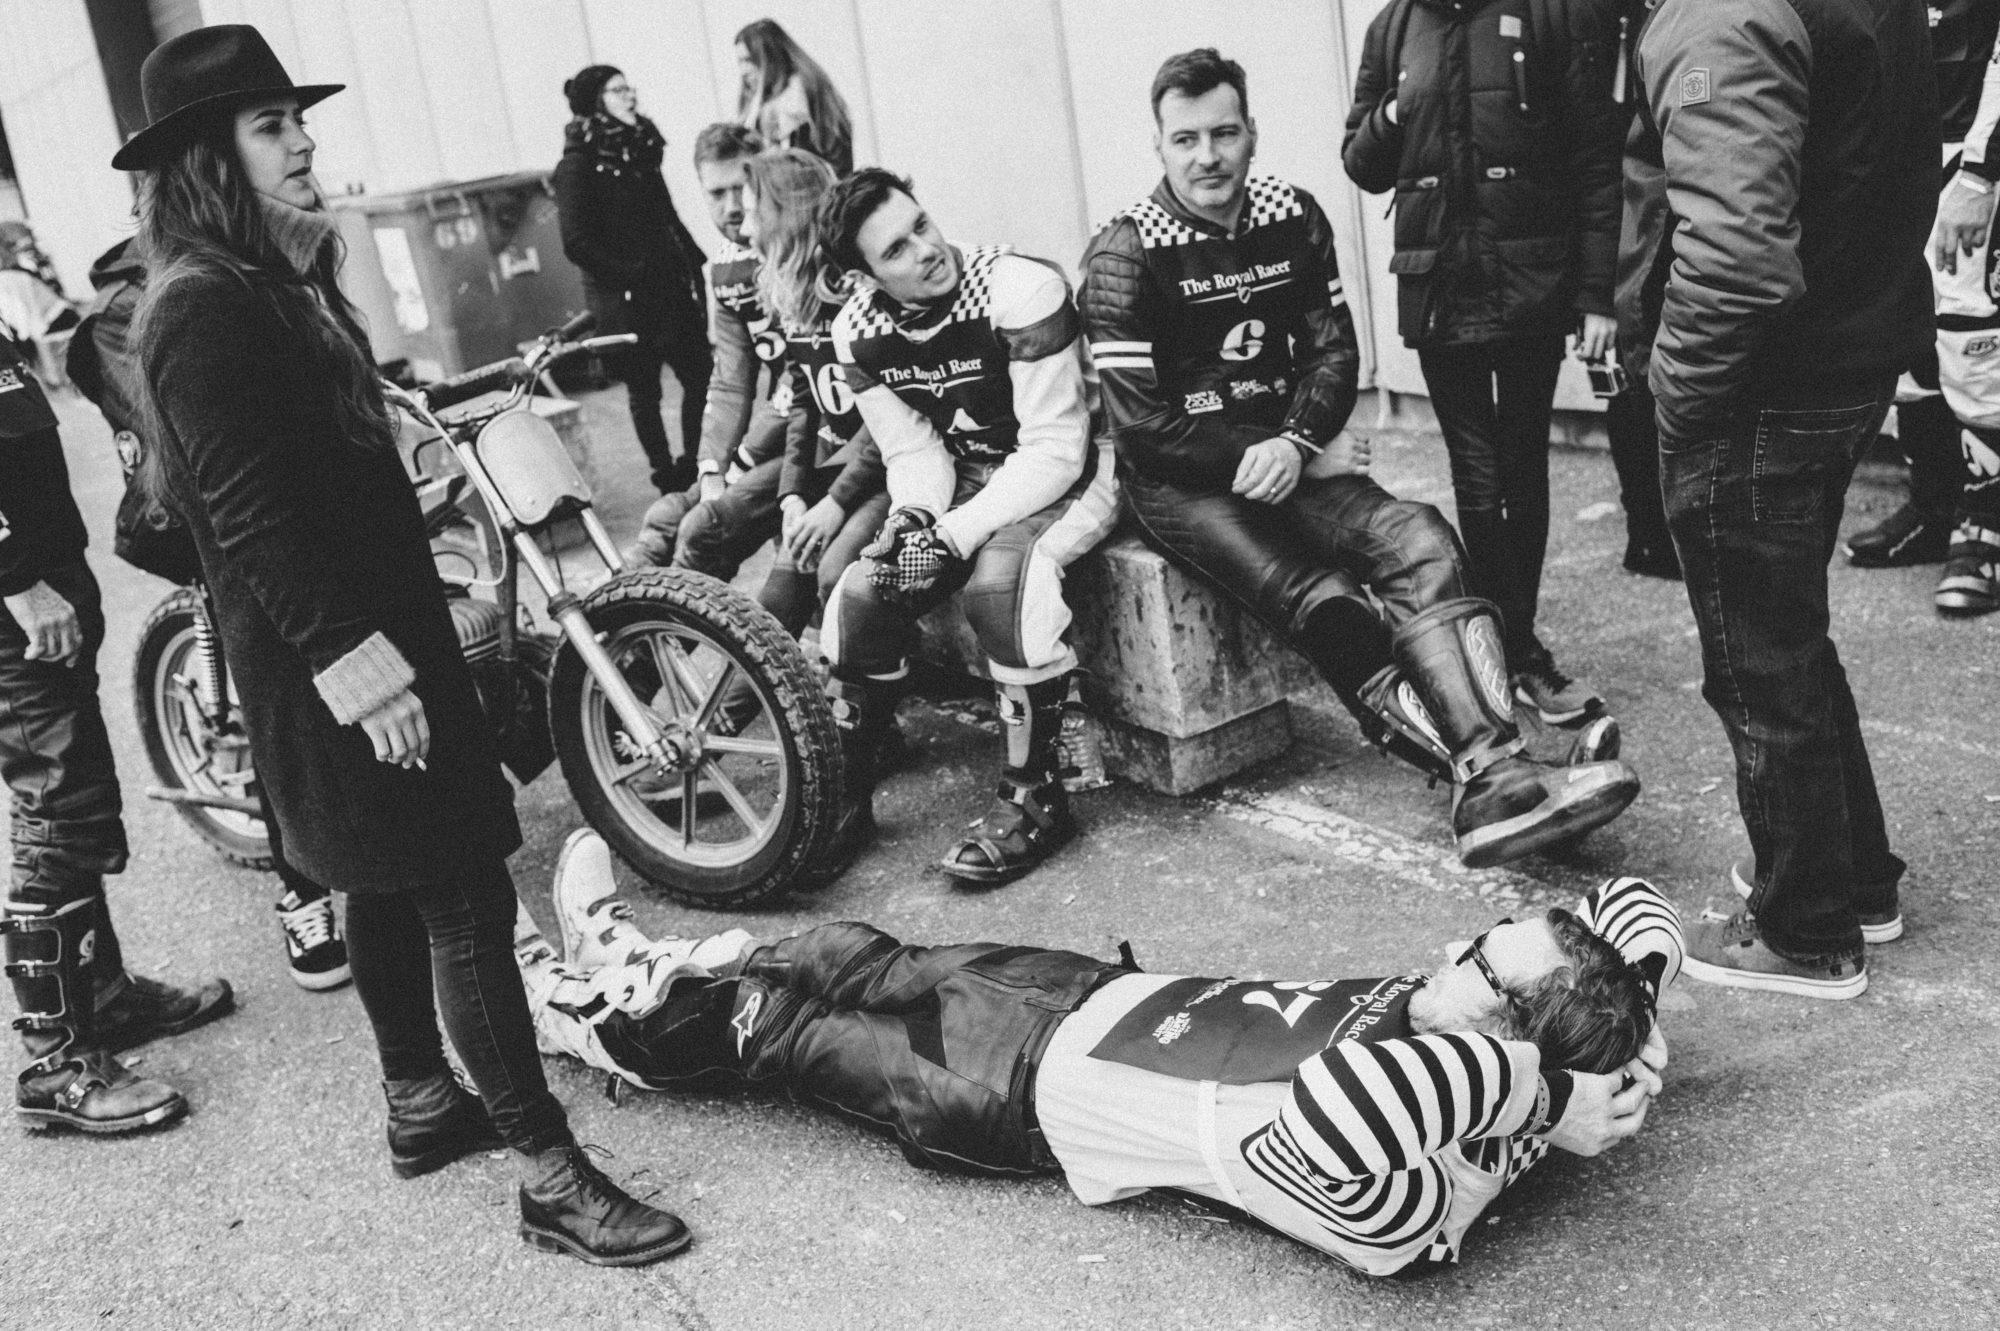 Flat track indoor lyon 2017 editions iconiques for Salon de la moto 2017 lyon